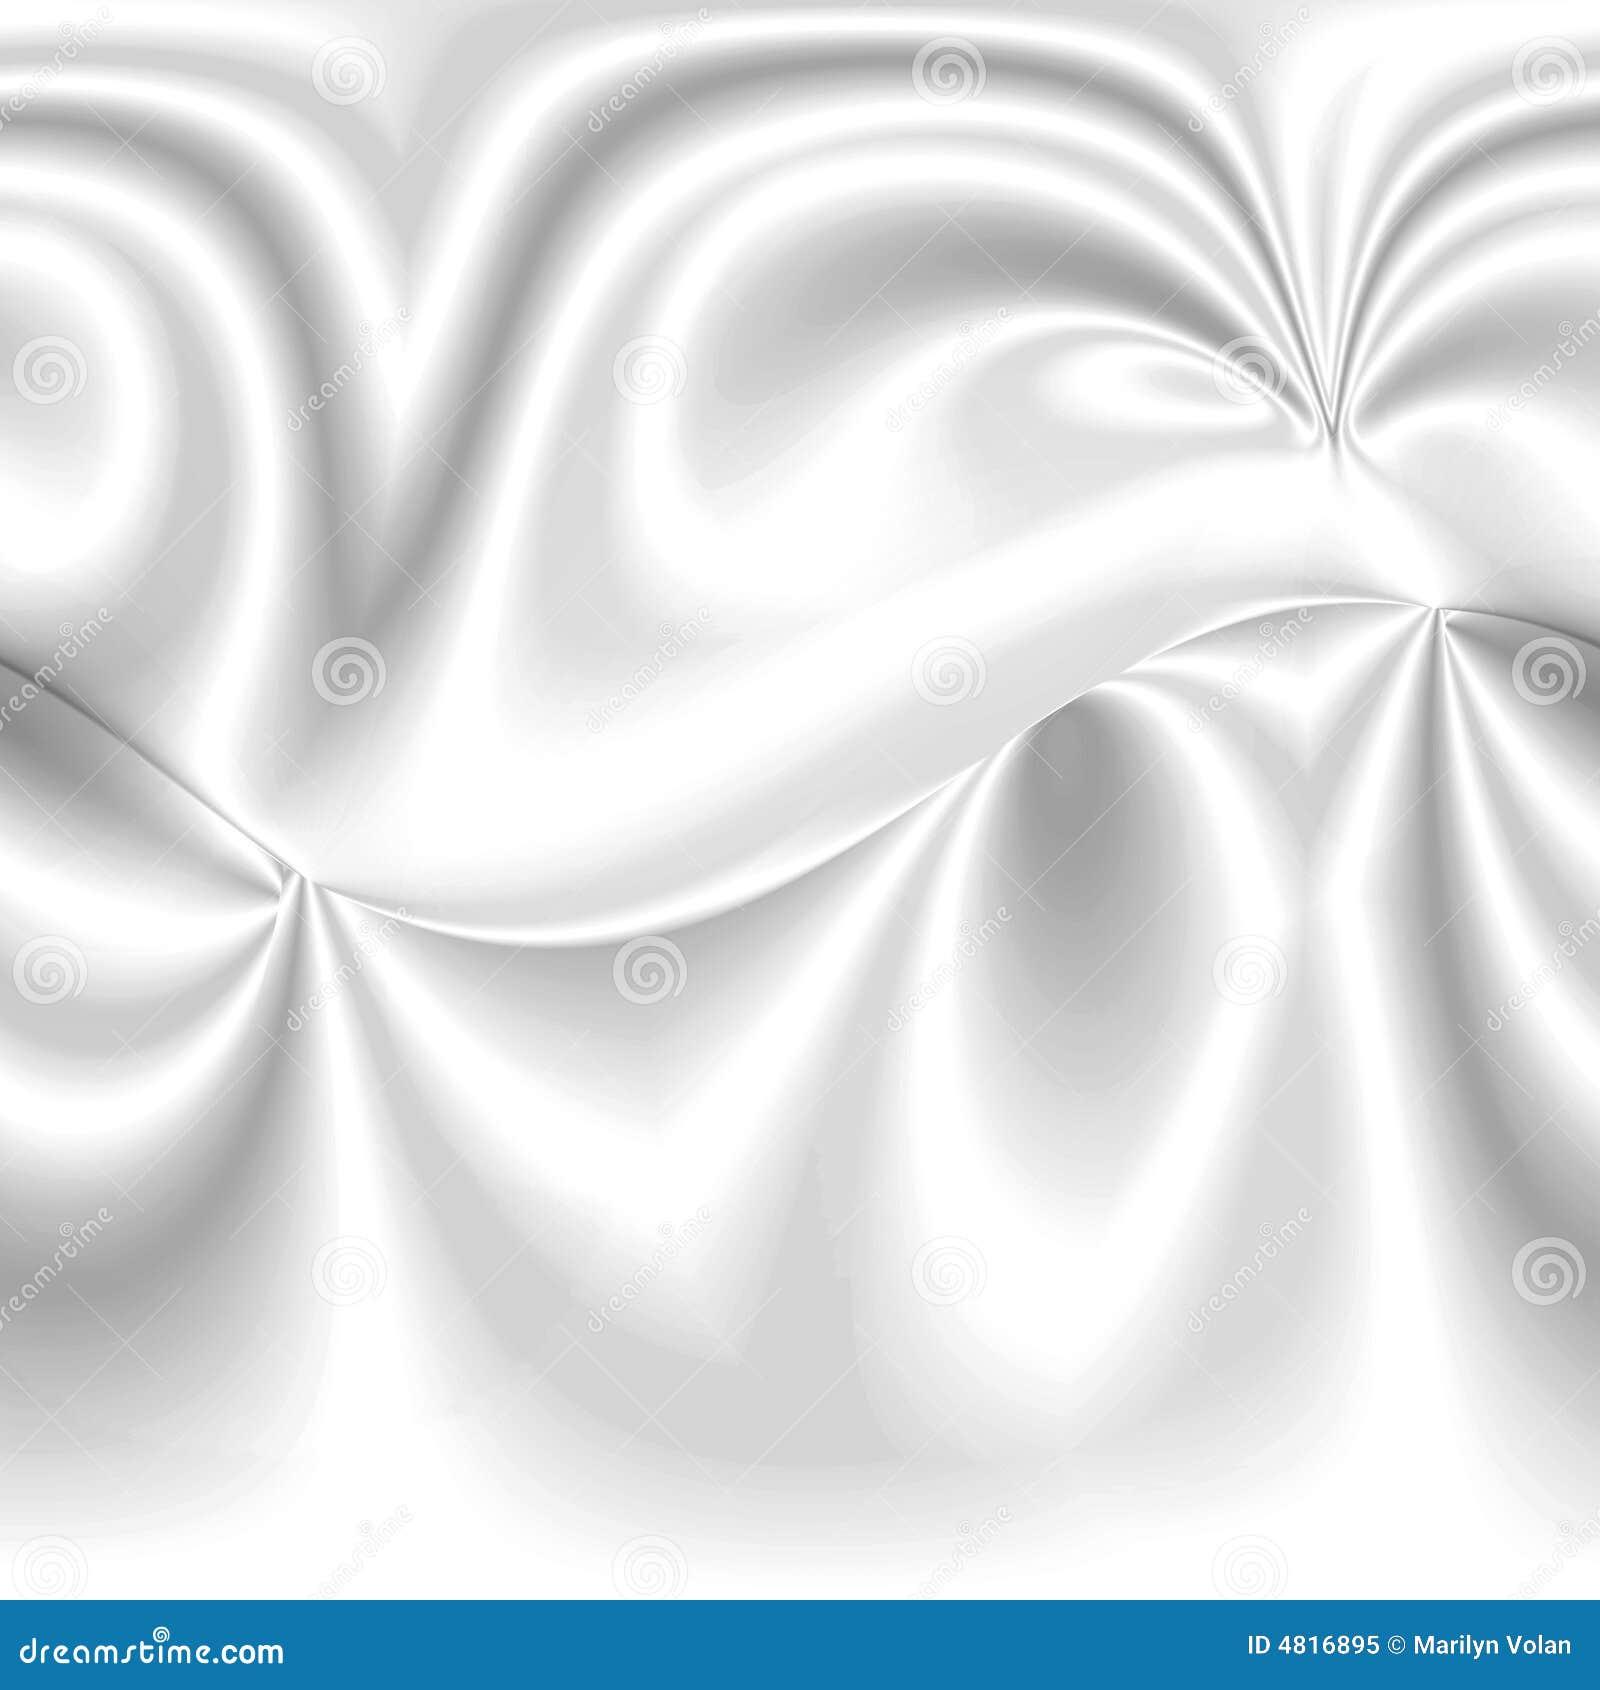 White Smooth Satin Background Royalty Free Stock Photo